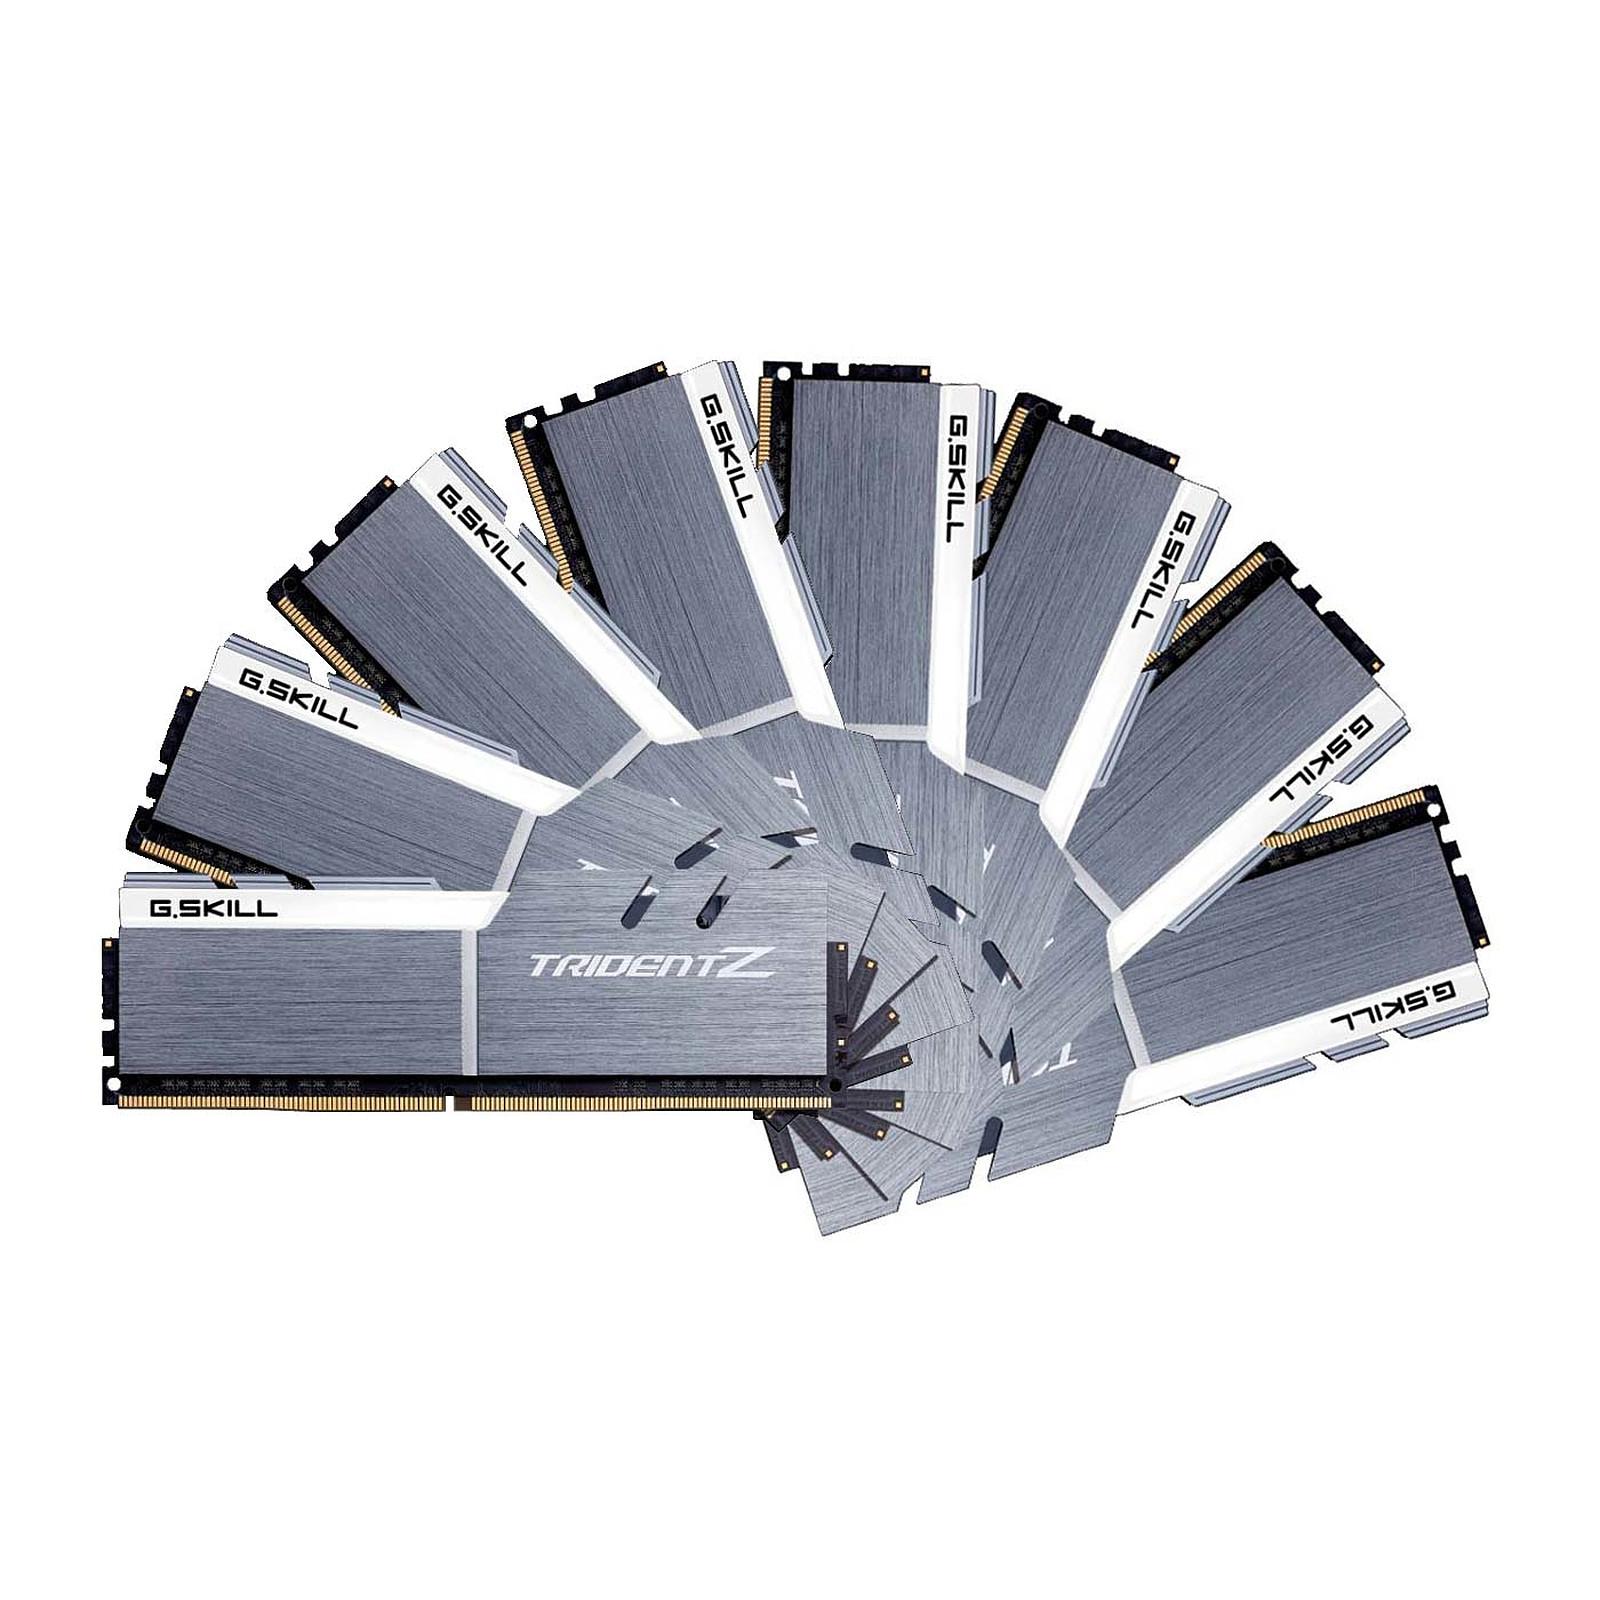 G.Skill Trident Z 64 Go (8x 8 Go) DDR4 4200 MHz CL19